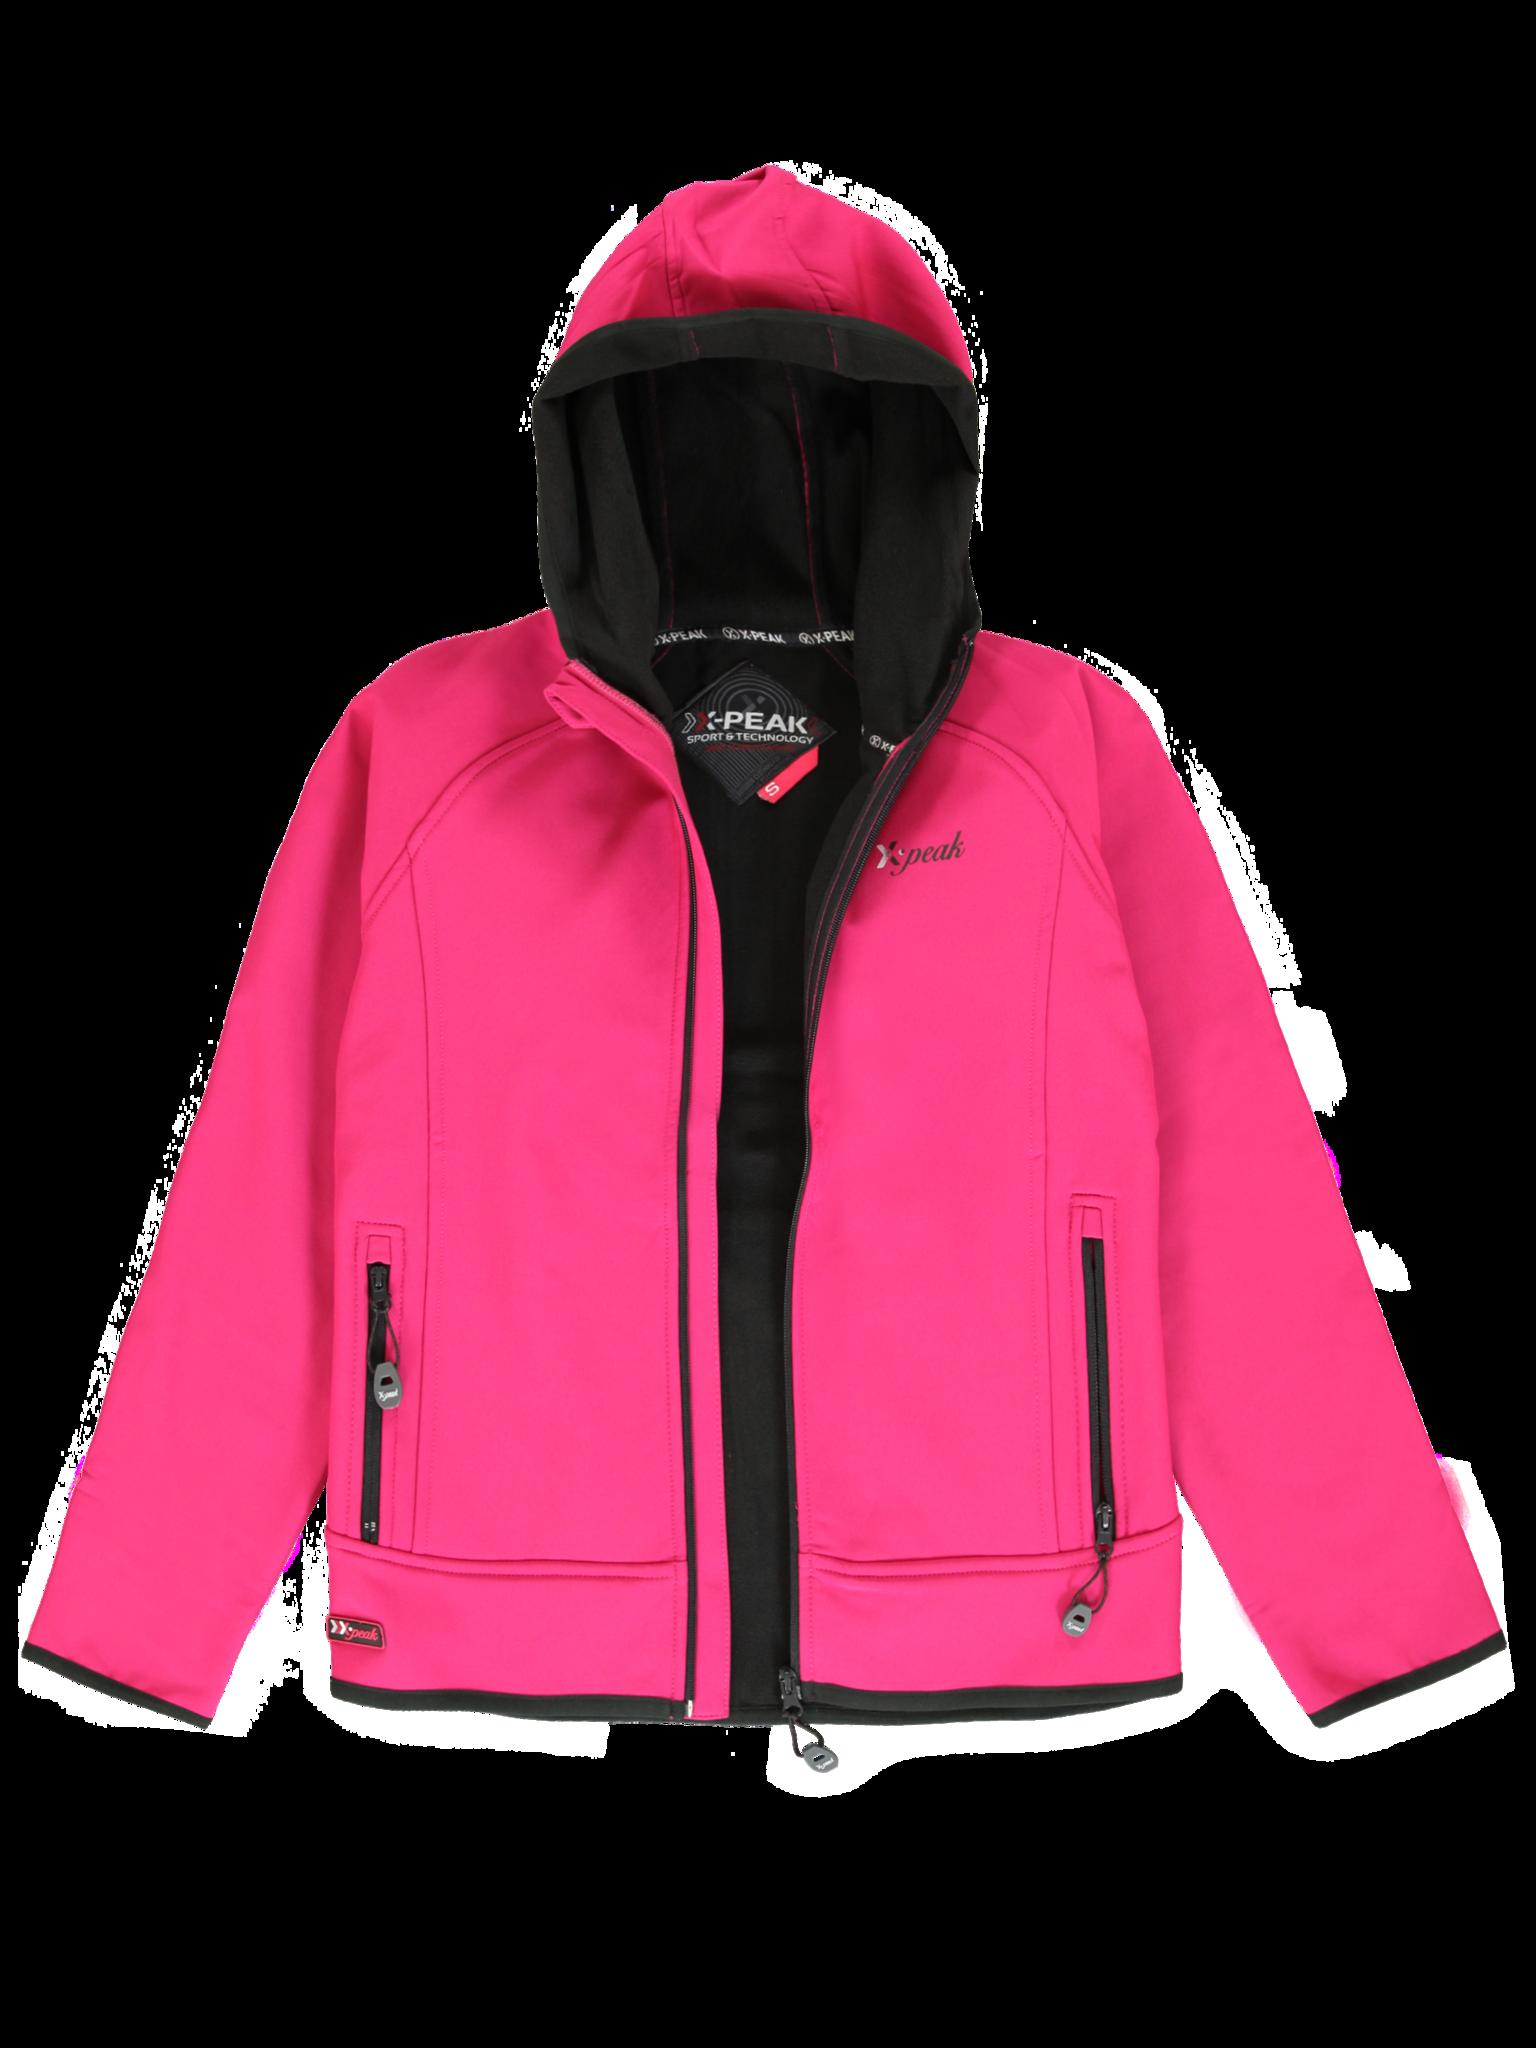 All Brands   Winterproducts Ladies   Cardigan Sweater   24 pcs/box